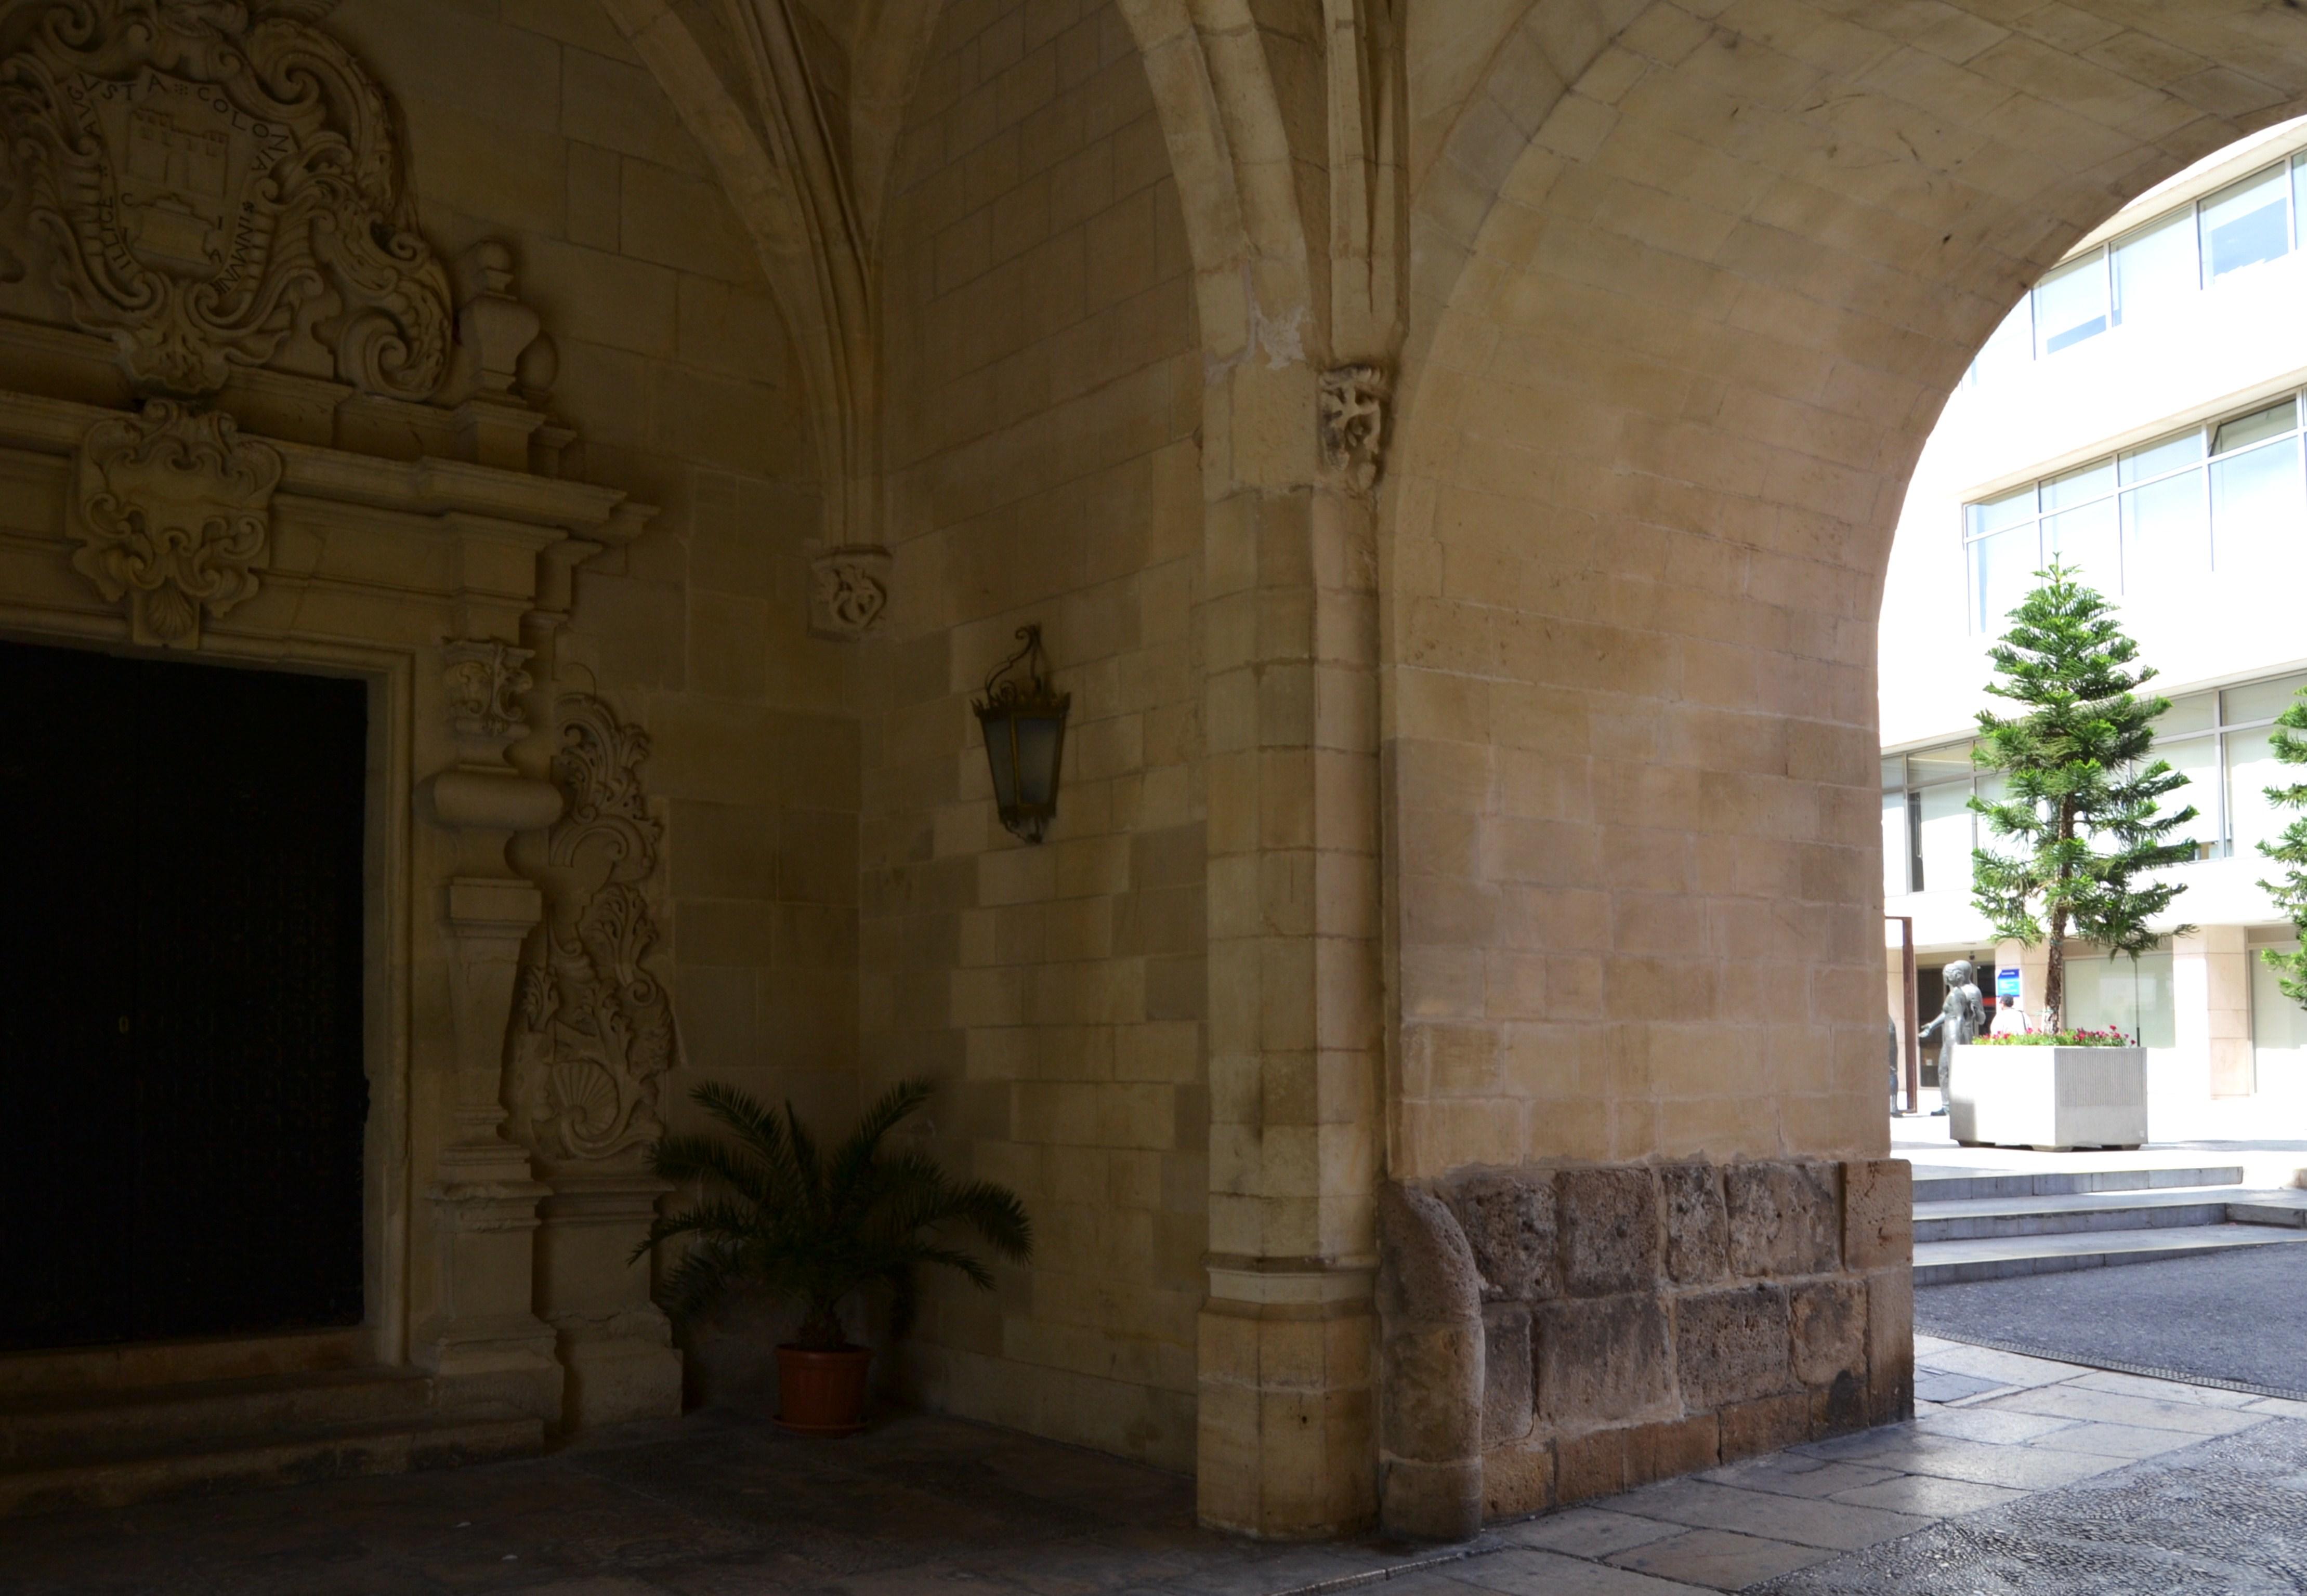 file interior del portal de la torre del consell